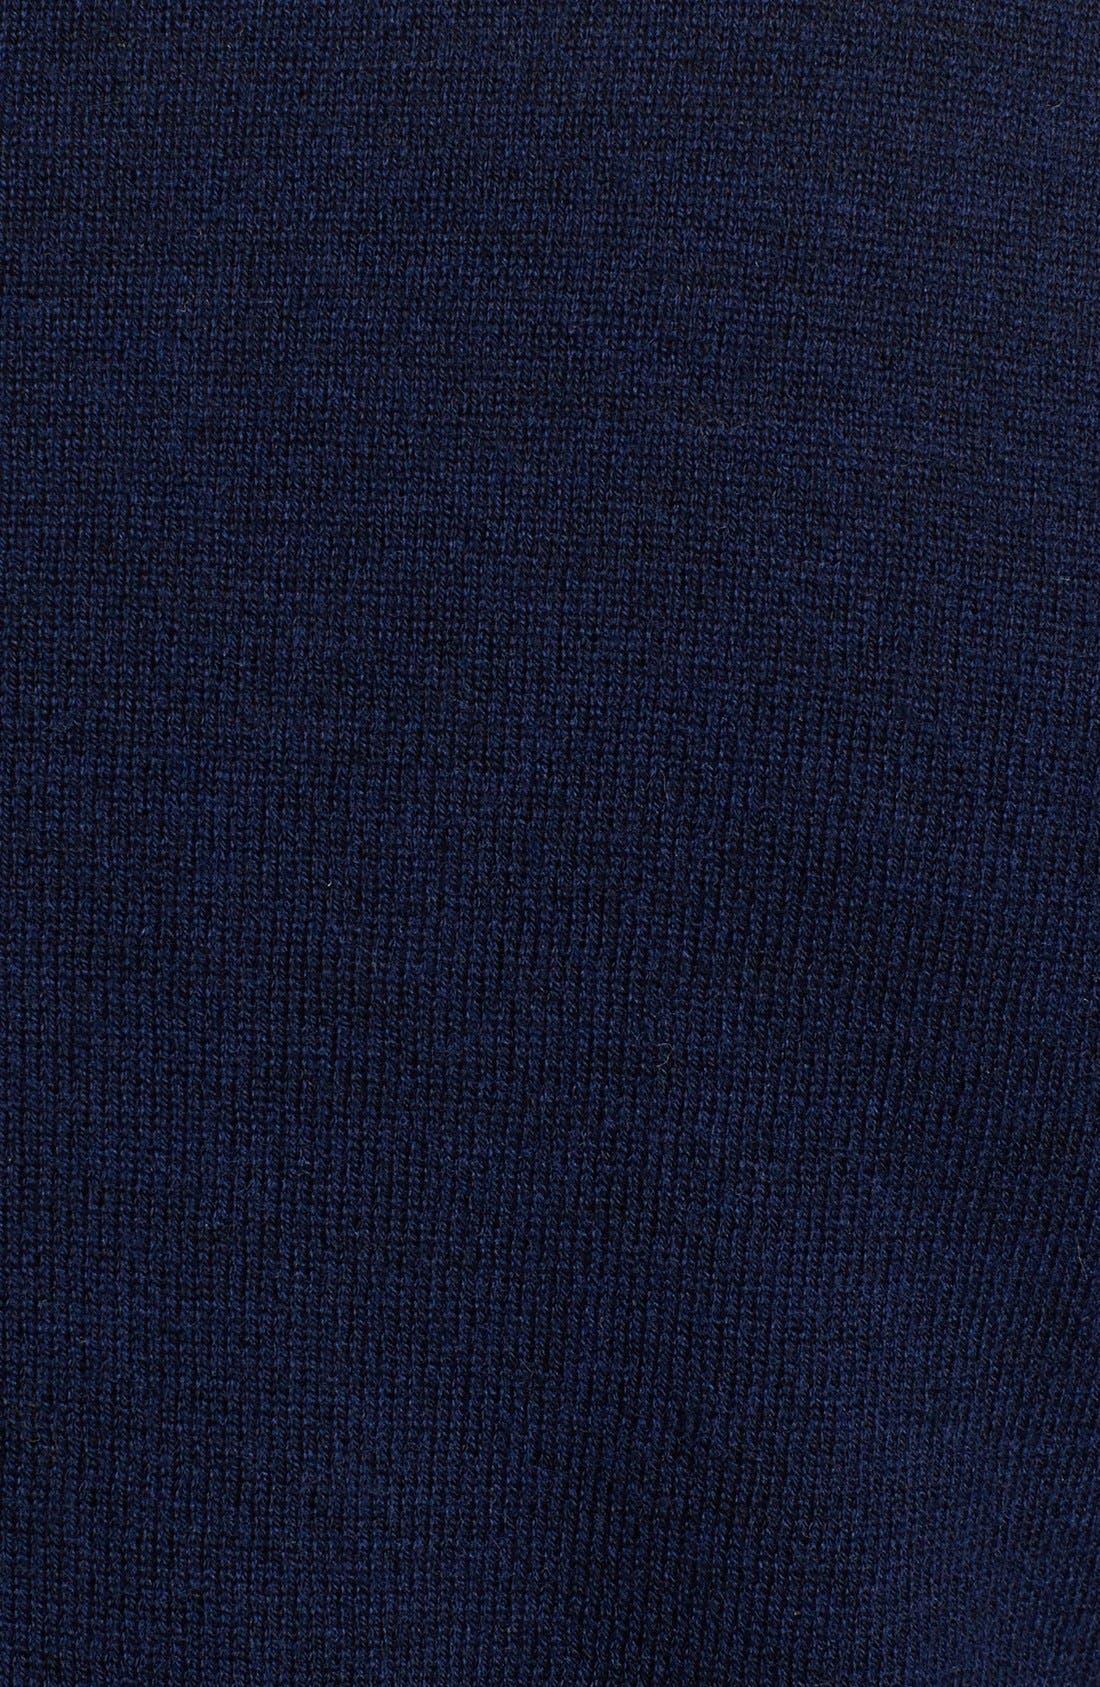 Alternate Image 3  - rag & bone 'Abingdon' V-Neck Merino Wool Sweater